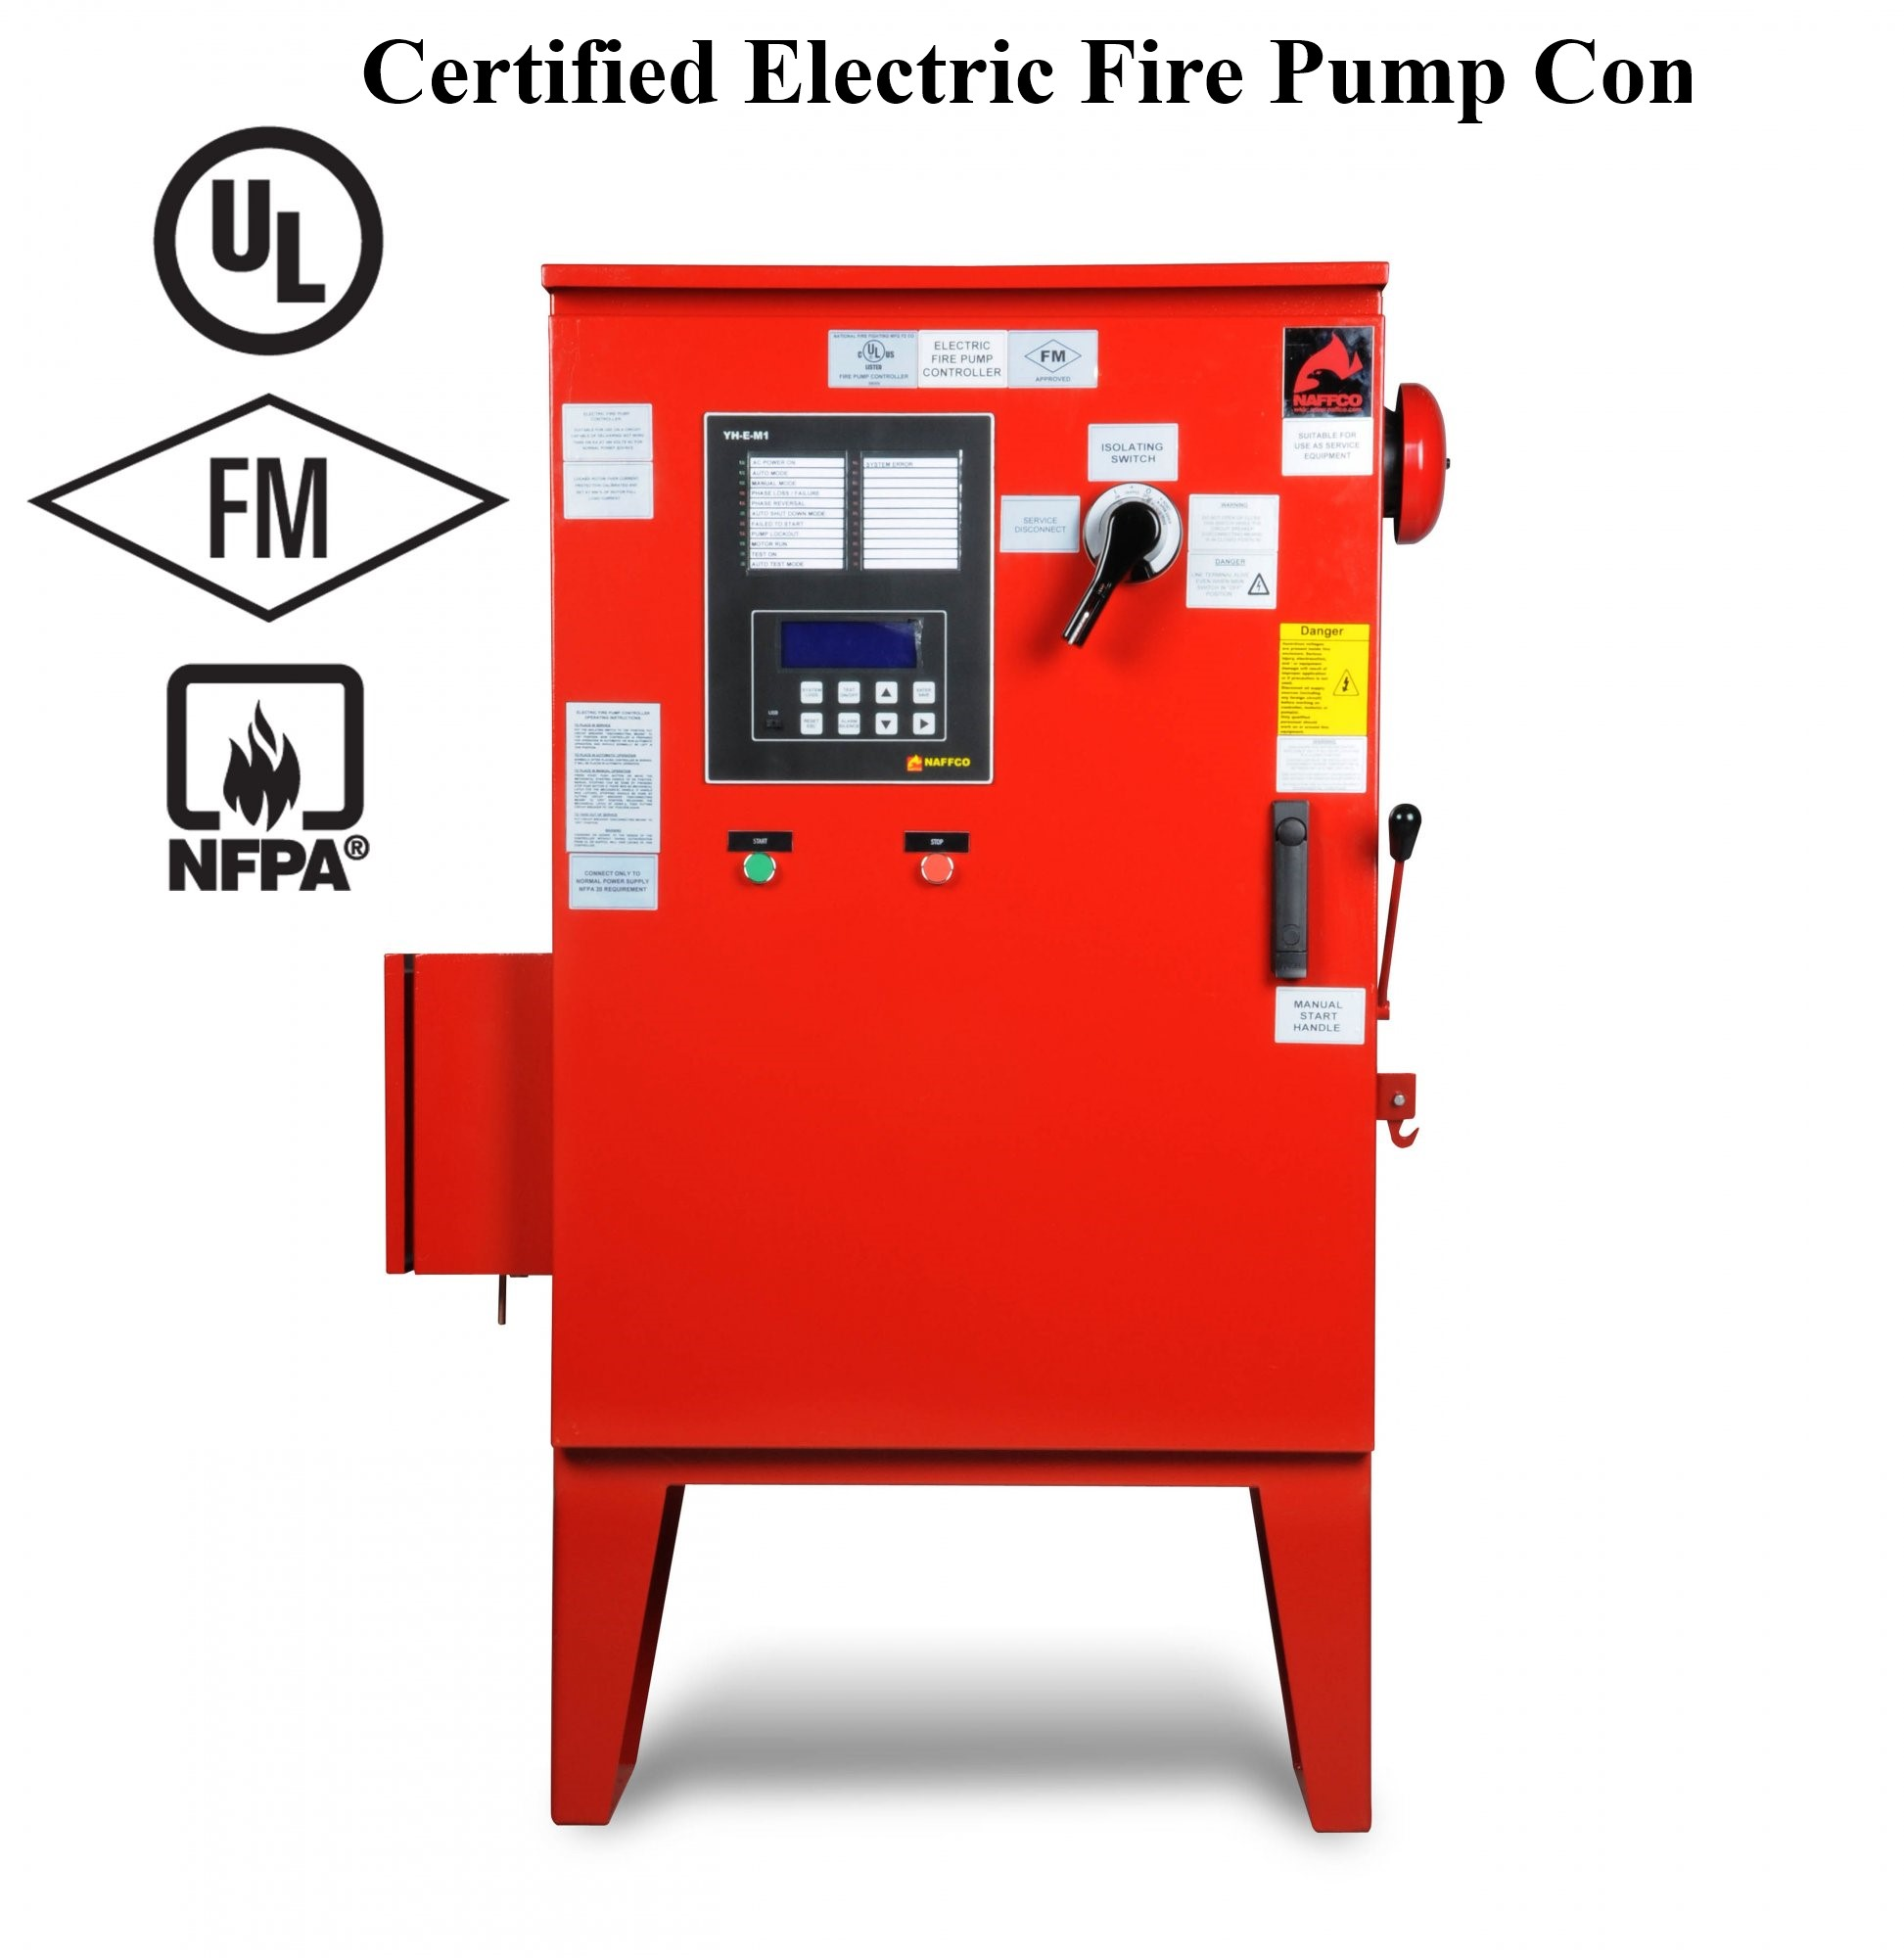 Certified_Electric_Fire_Pump_Controller_1447563101_wz530